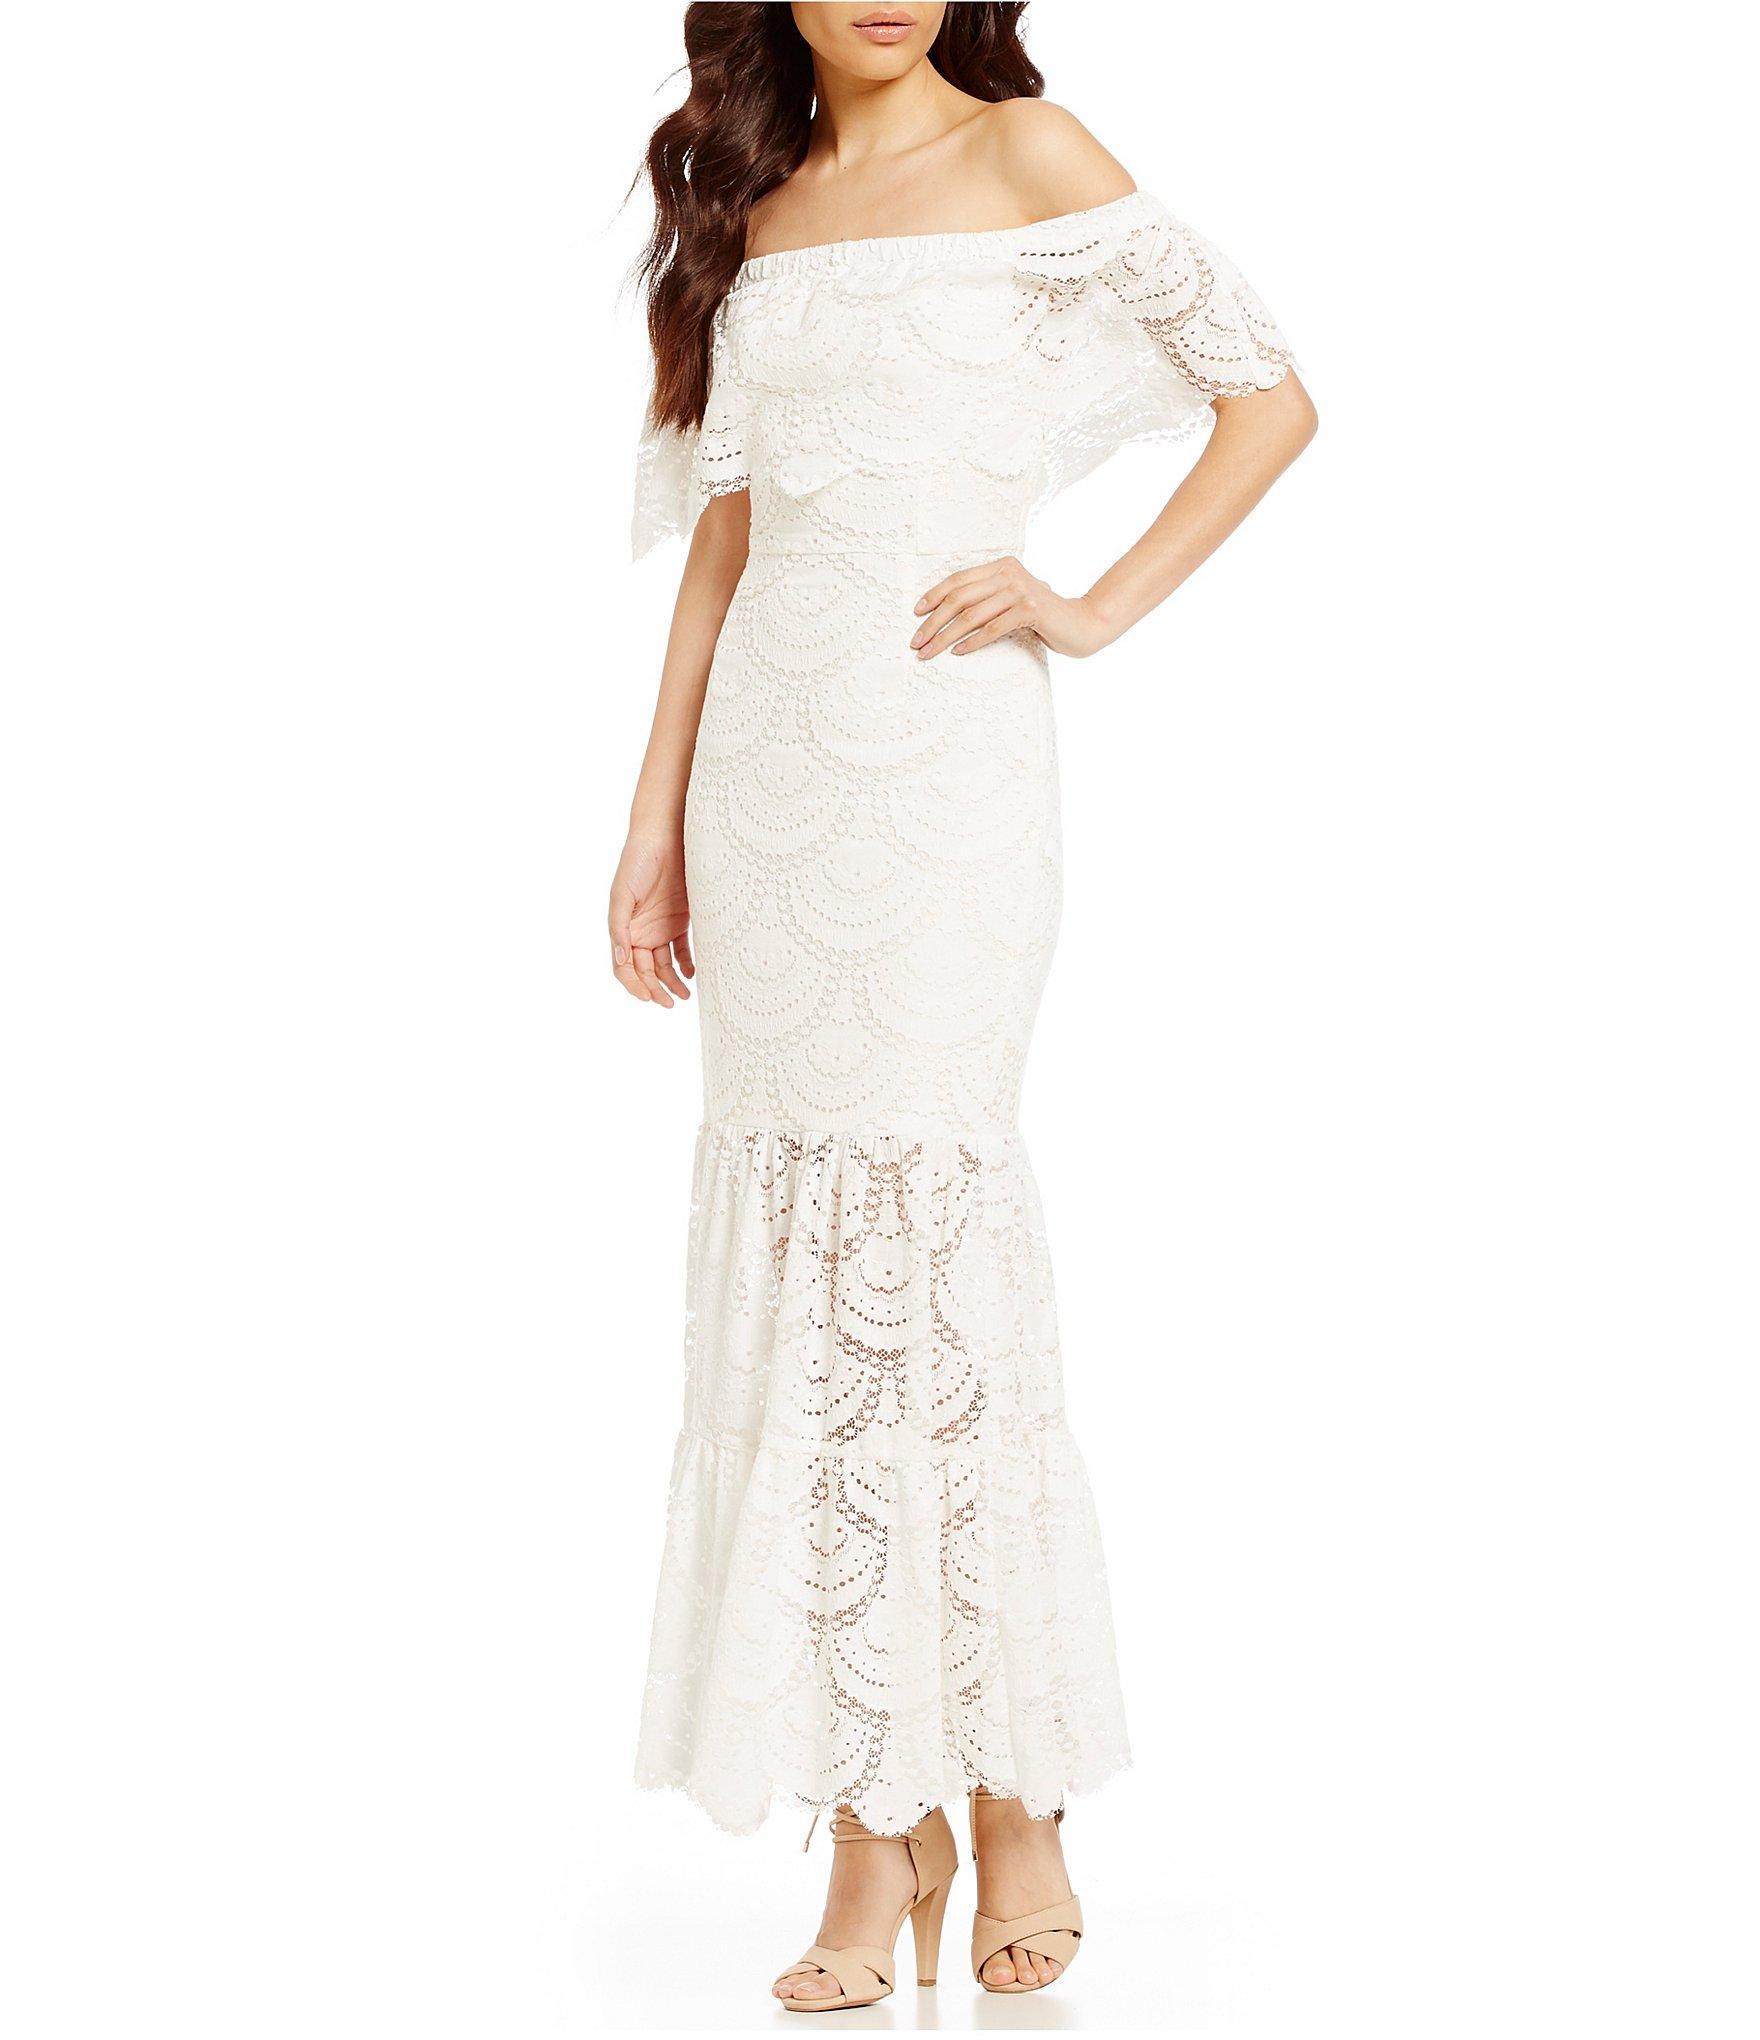 9cd424313b Gianni Bini Reina Off-the-shoulder Short Sleeve Lace Maxi Dress in ...